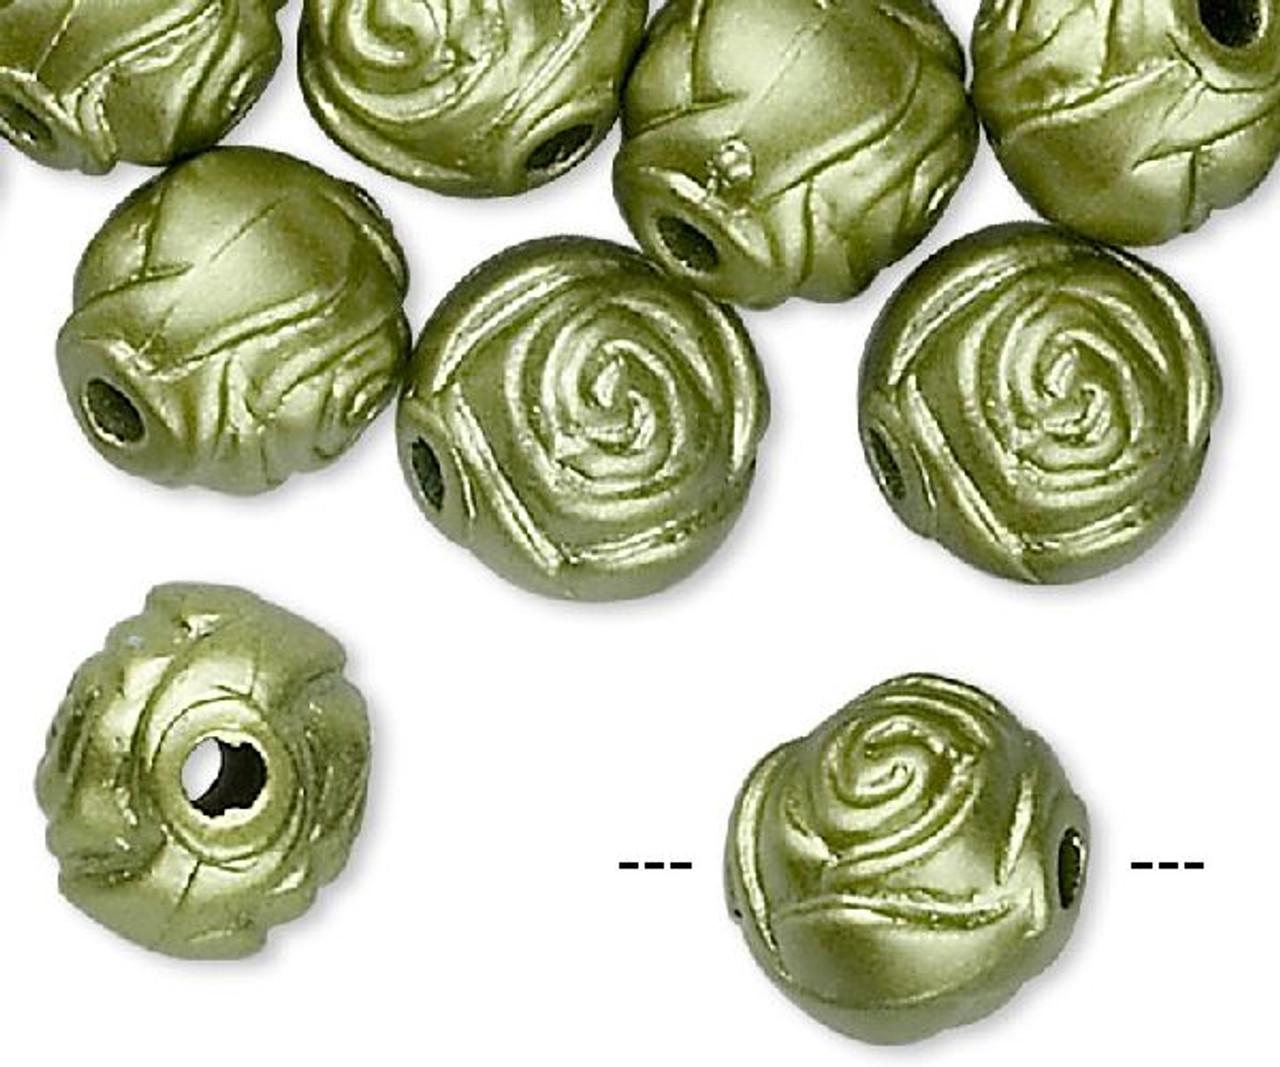 100 Metallic Teal Acrylic 8mm Round Rose Flower Beads